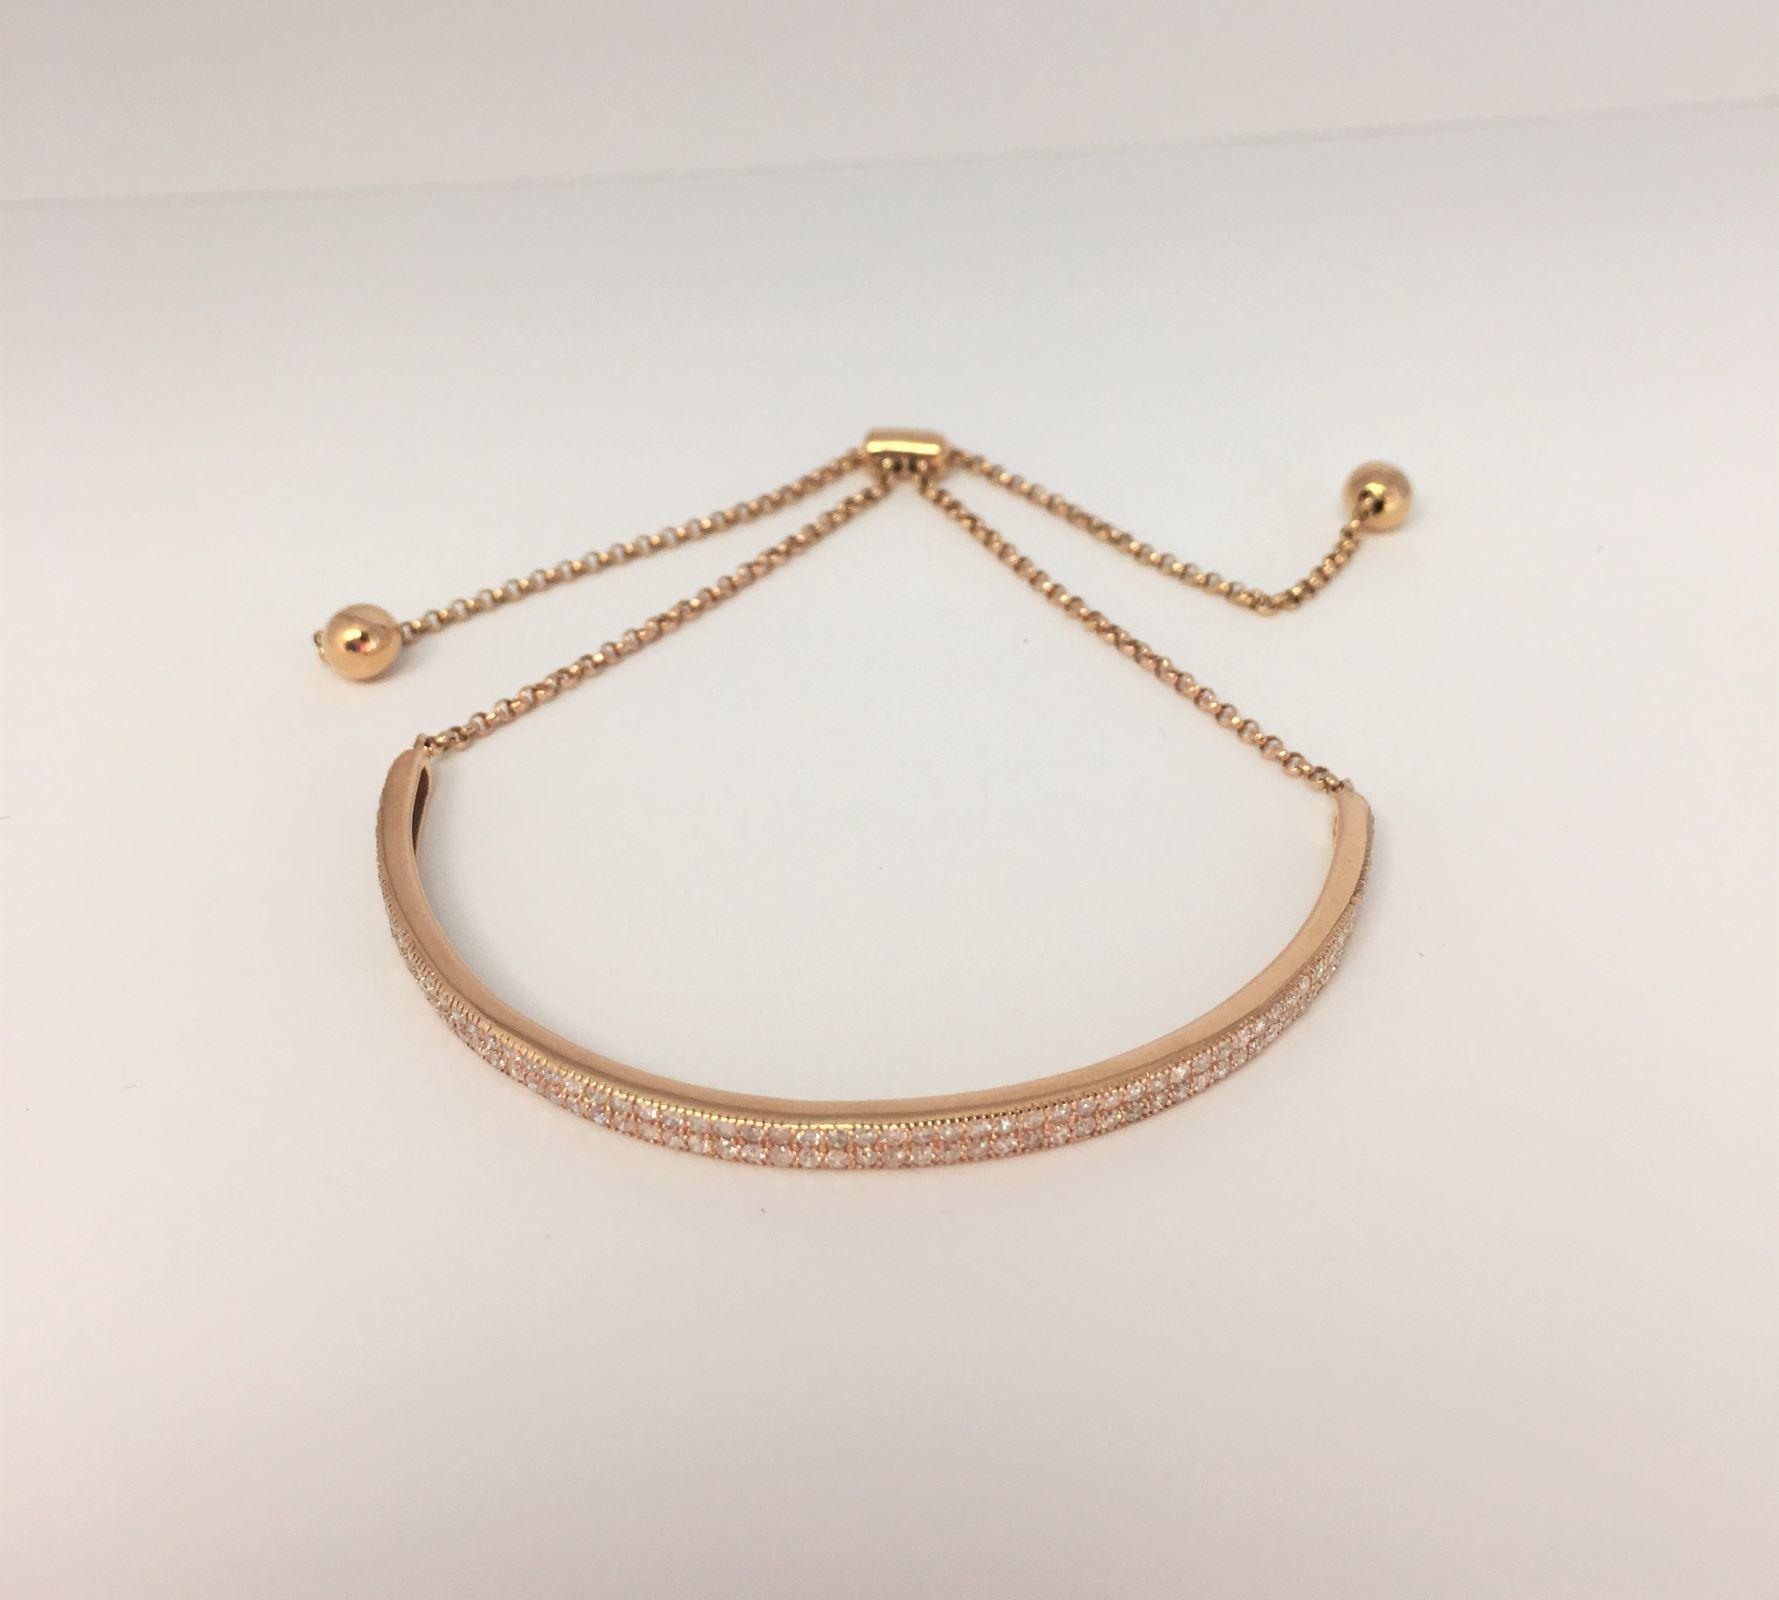 1 Carat Diamond Adjustable Bangle Bracelet In Rose Gold